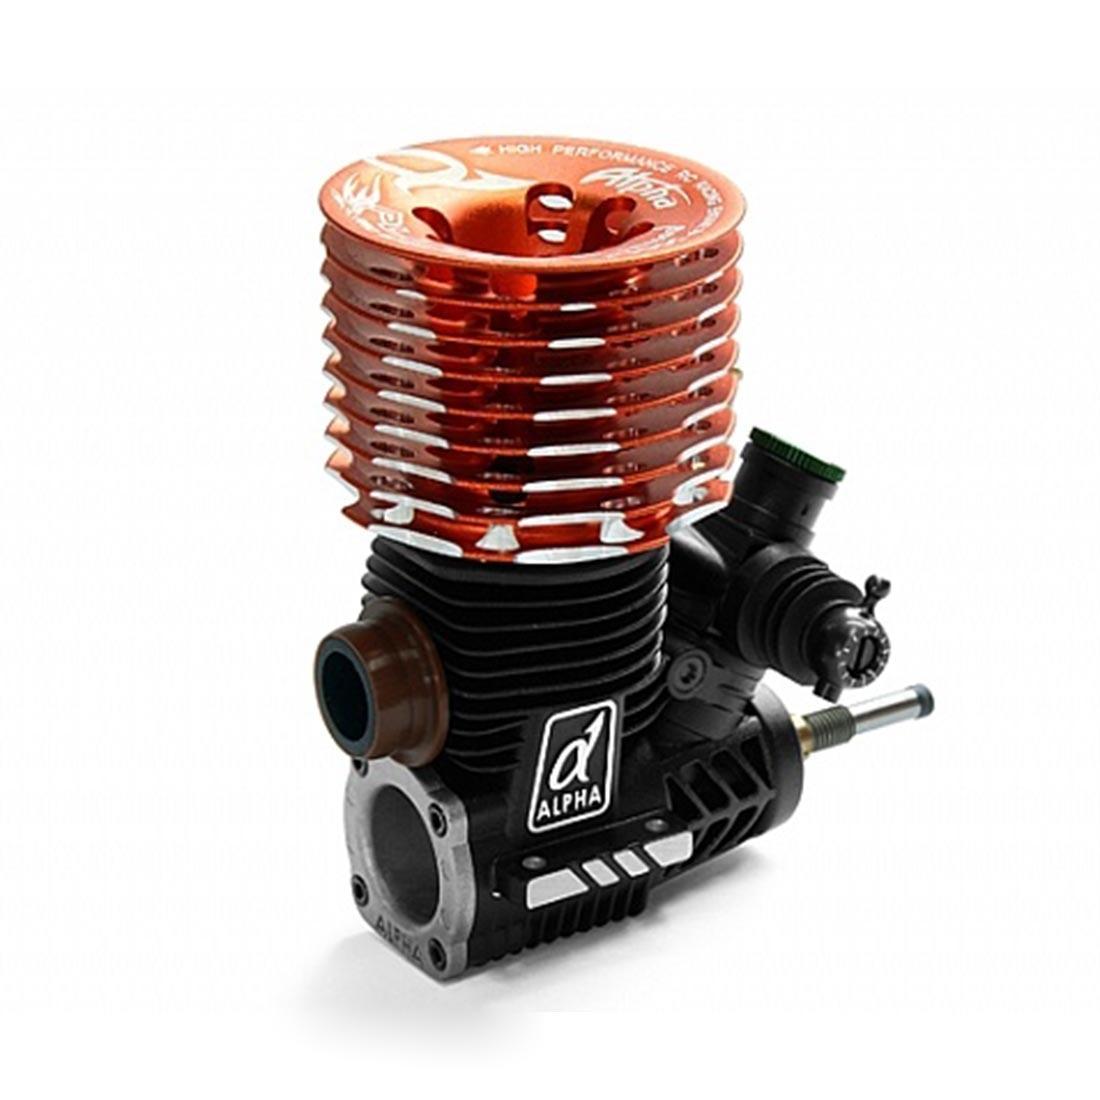 2020 High Quality Alpha TT5PA(T850) Level 28 5P Racing Car Methanol Engine